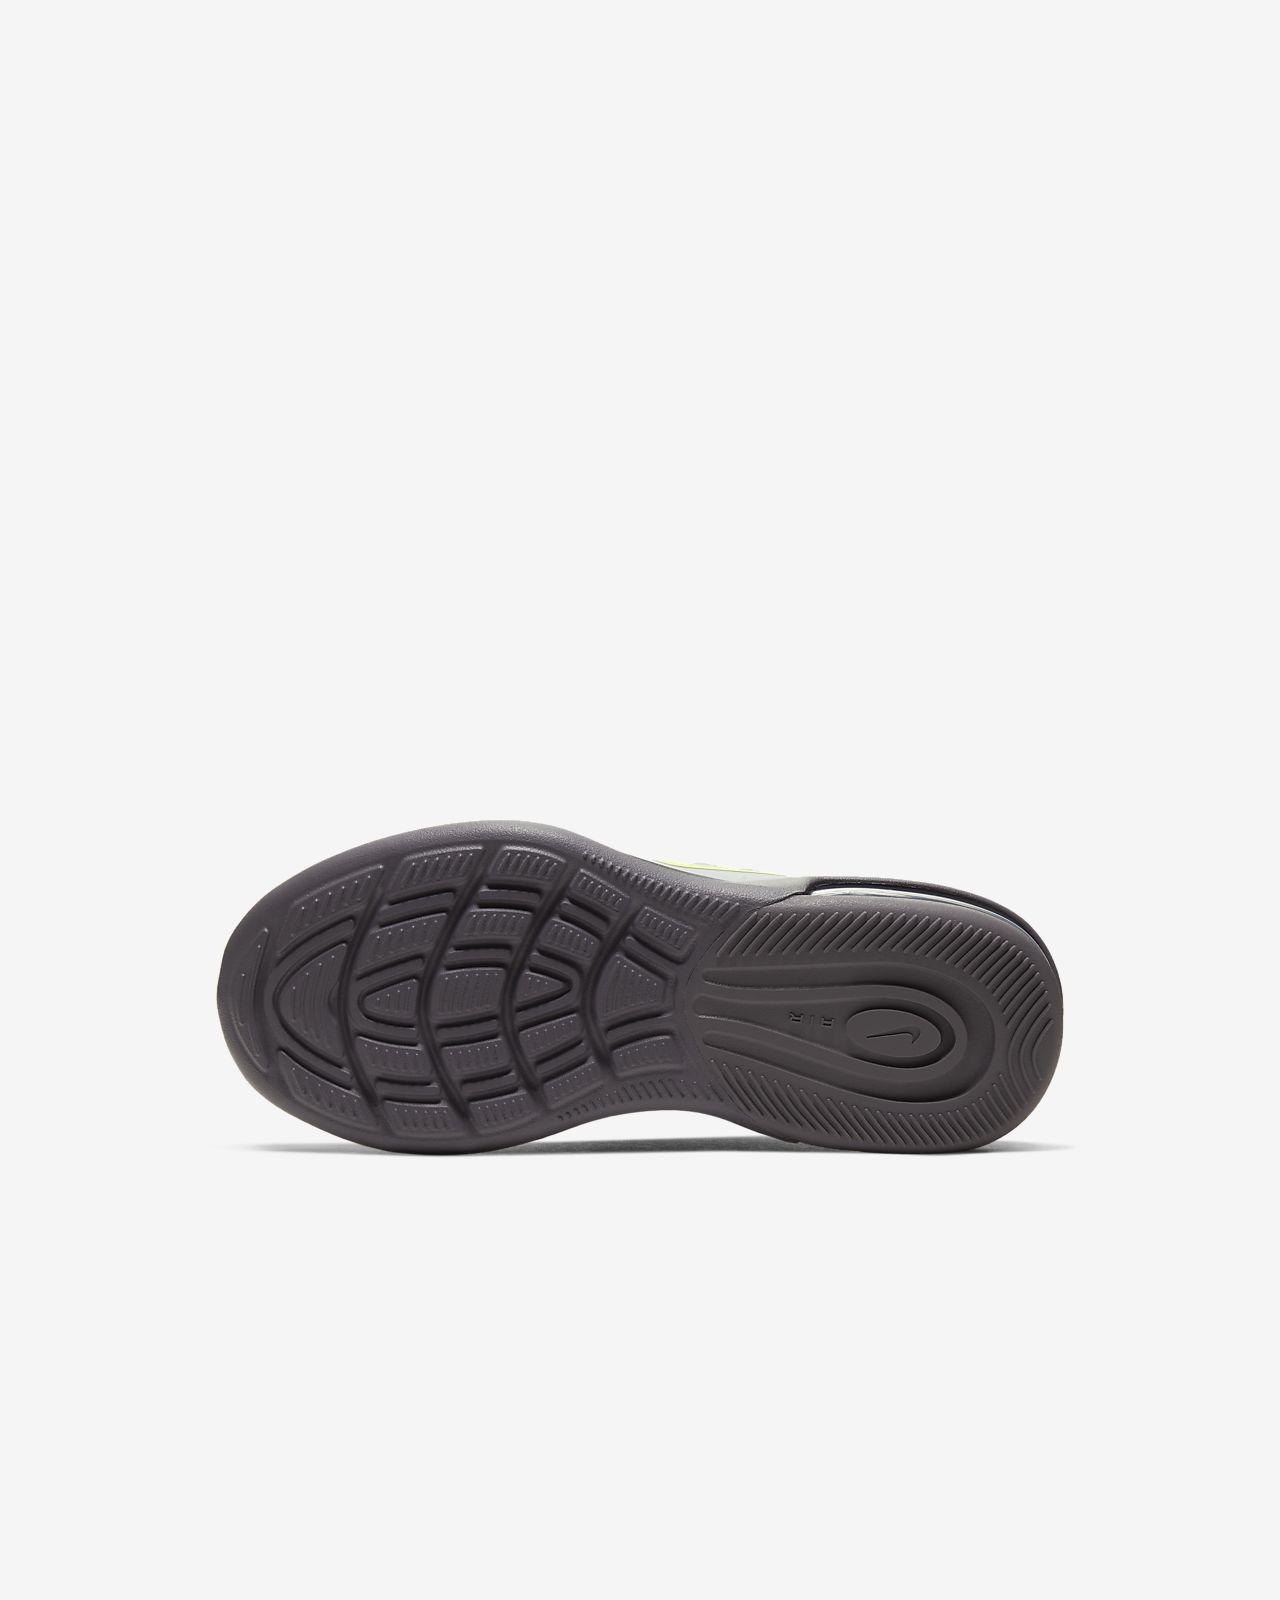 Sko Nike Air Max Axis för små barn. Nike SE